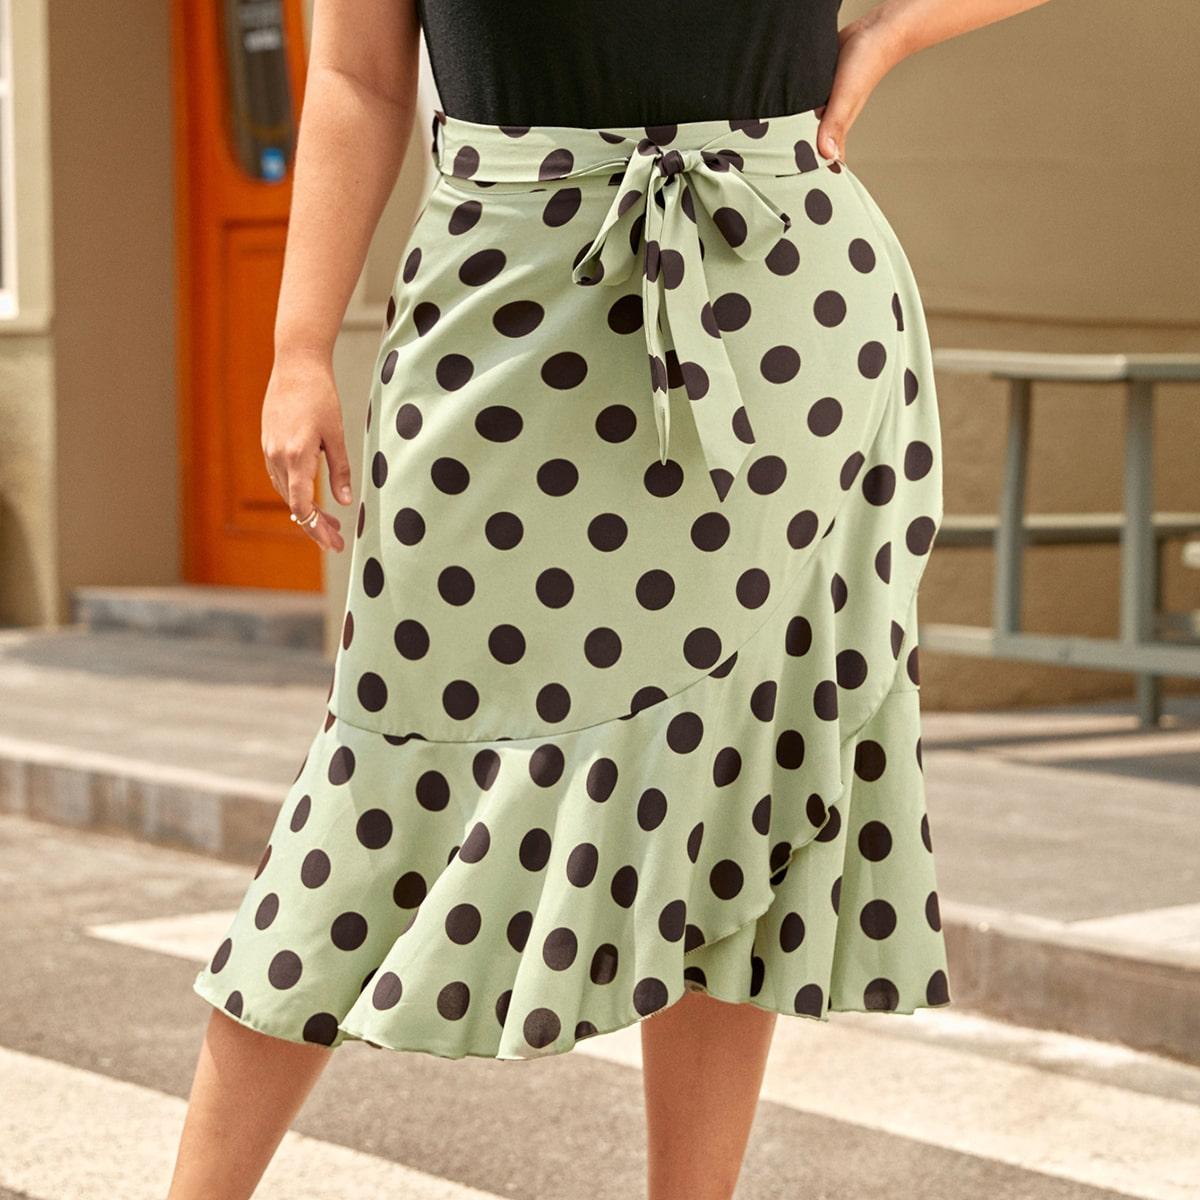 Plus Polka Dot Self Tie Wrap Skirt, SHEIN  - buy with discount